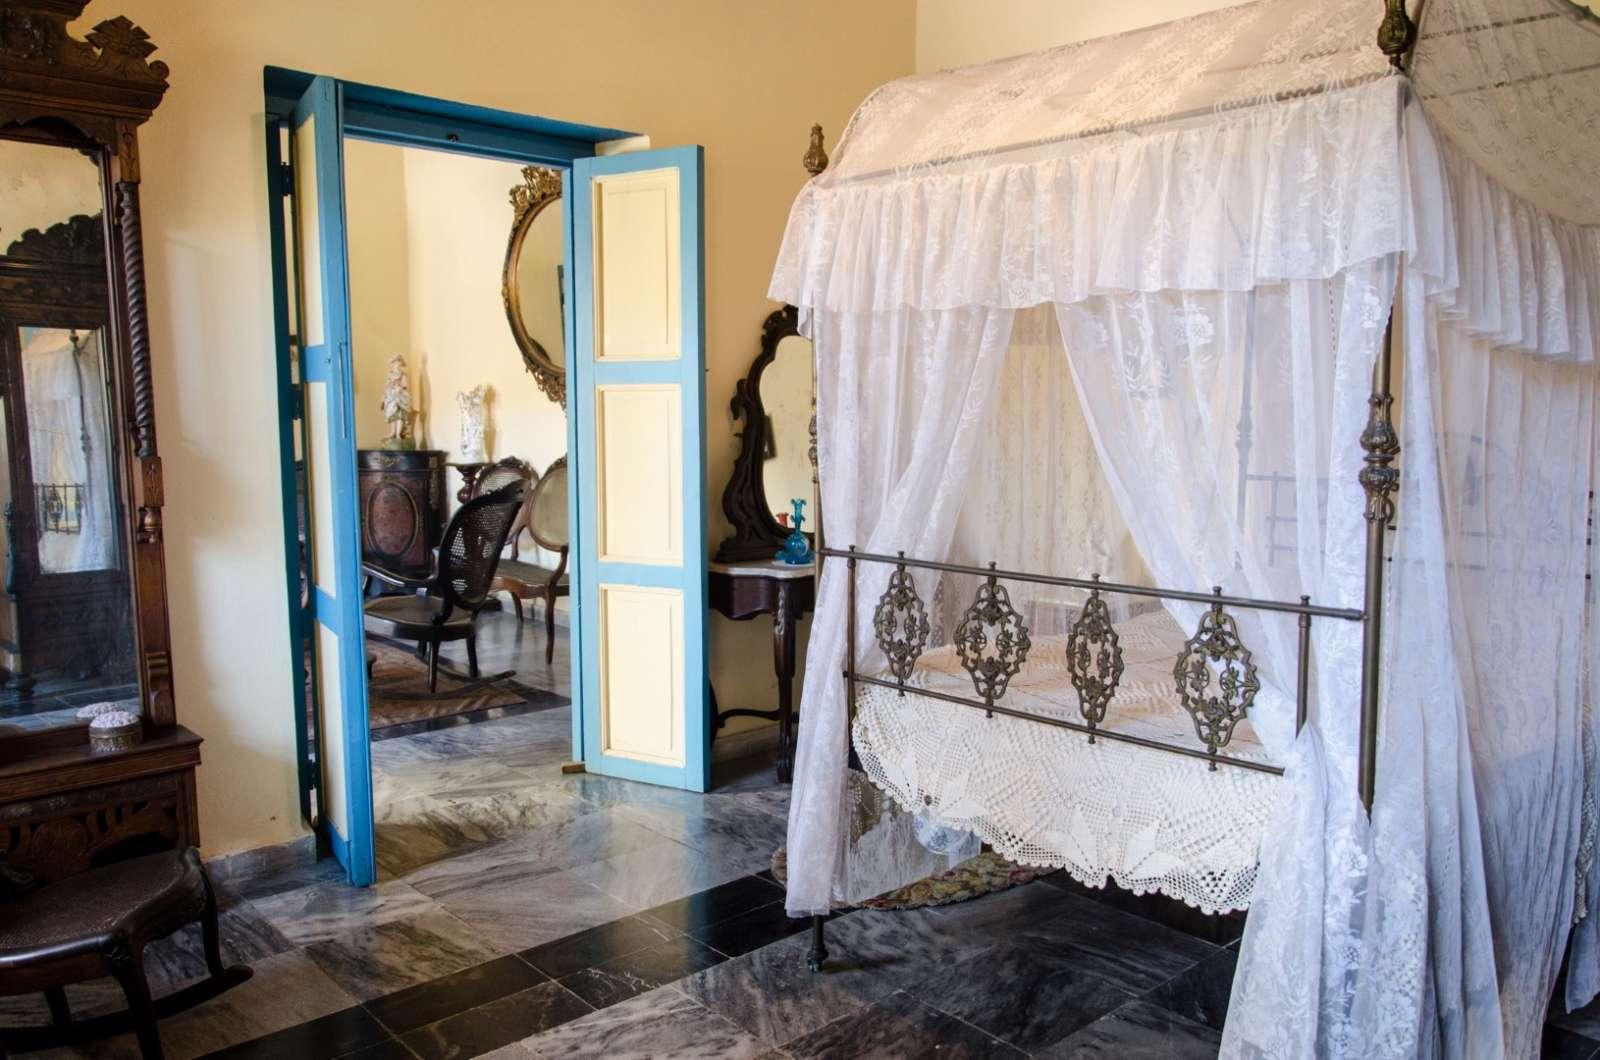 A room at the museum in Santa Clara, Cuba